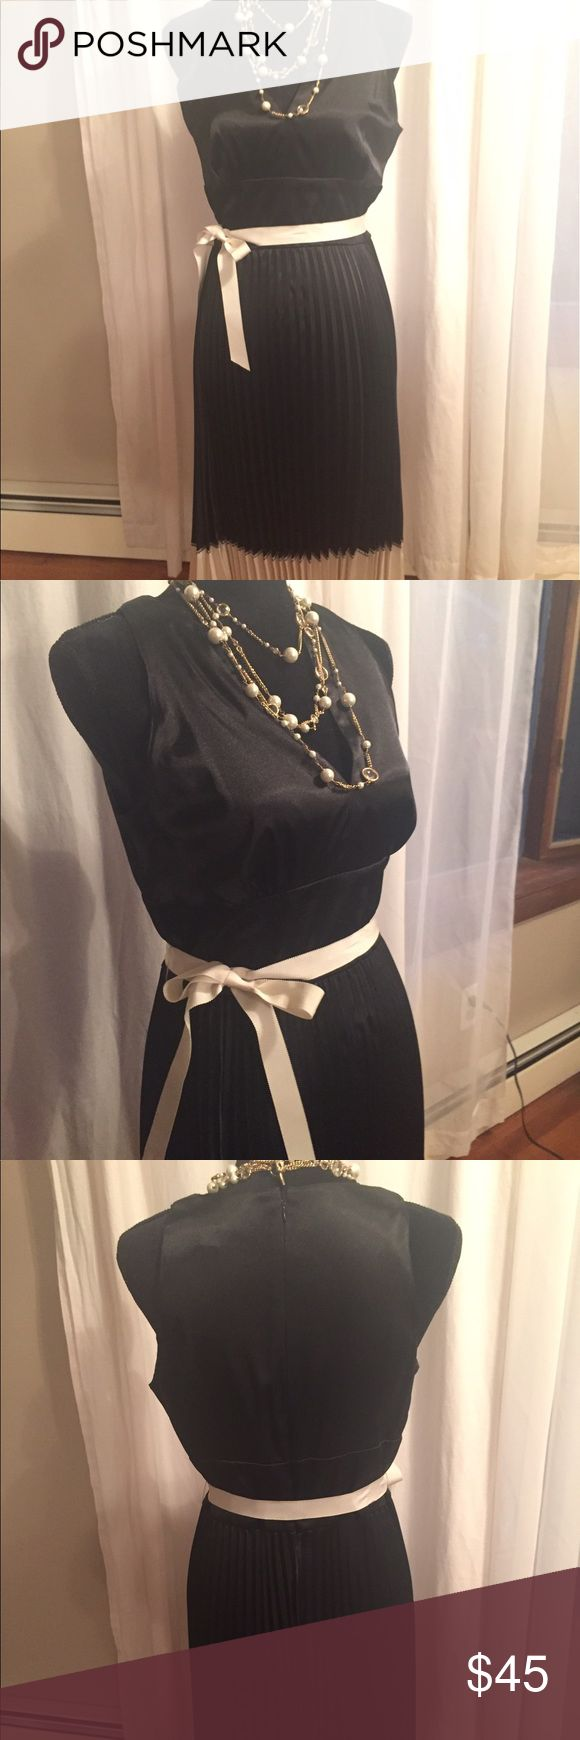 Chetta B pleated cocktail dress, size 10 Black and ivory silky pleated cocktail dress with grosgrain ribbon at waist. Gorgeous dress! Chetta B Dresses Midi